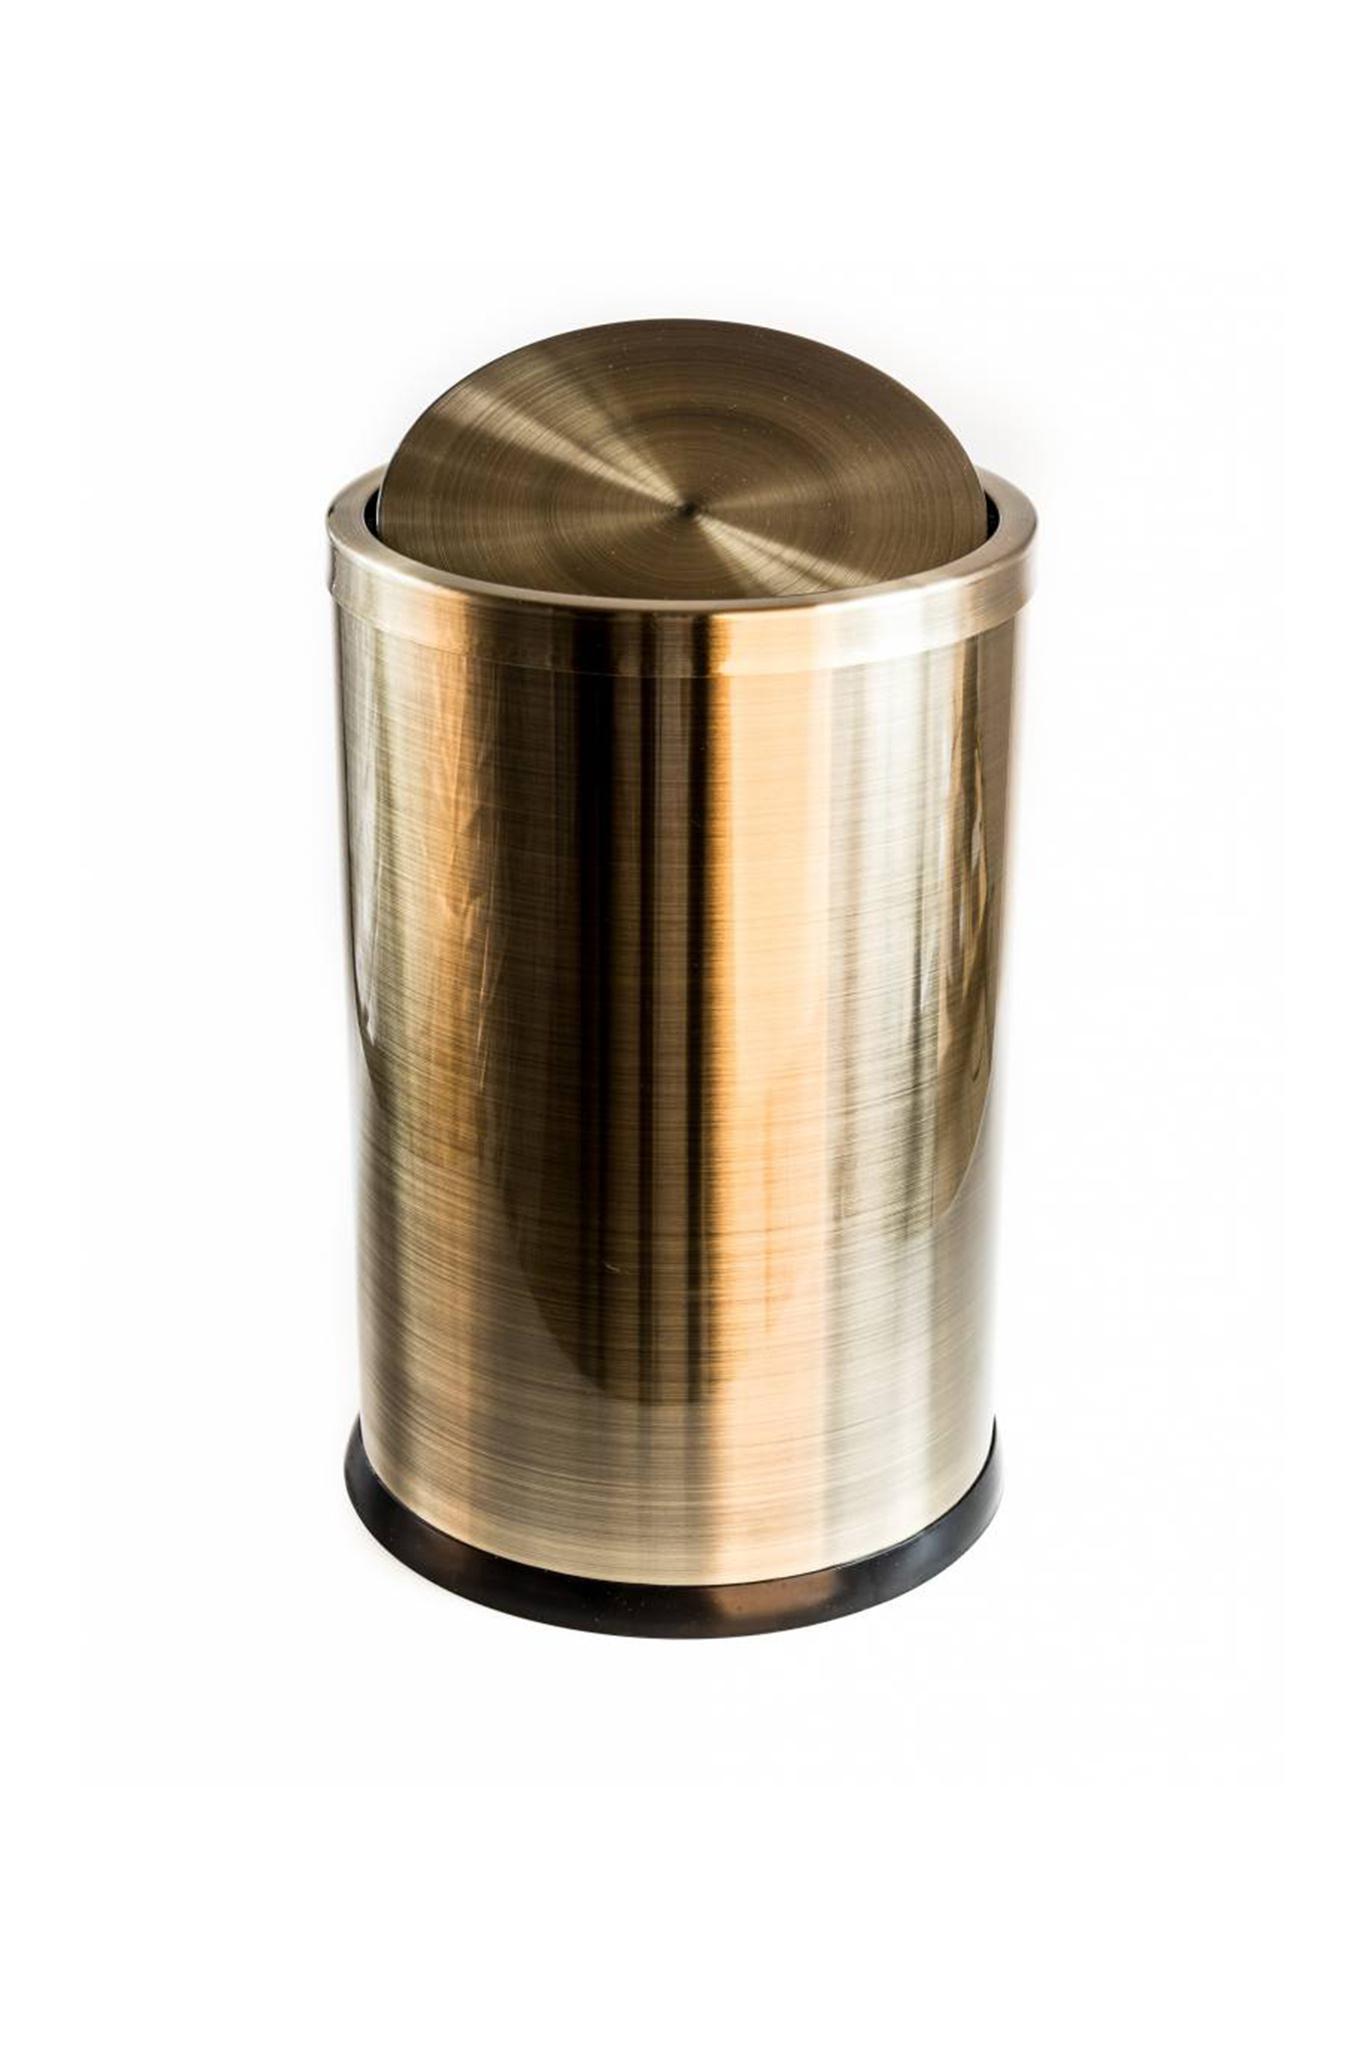 Pillows copper waste bin (6L)